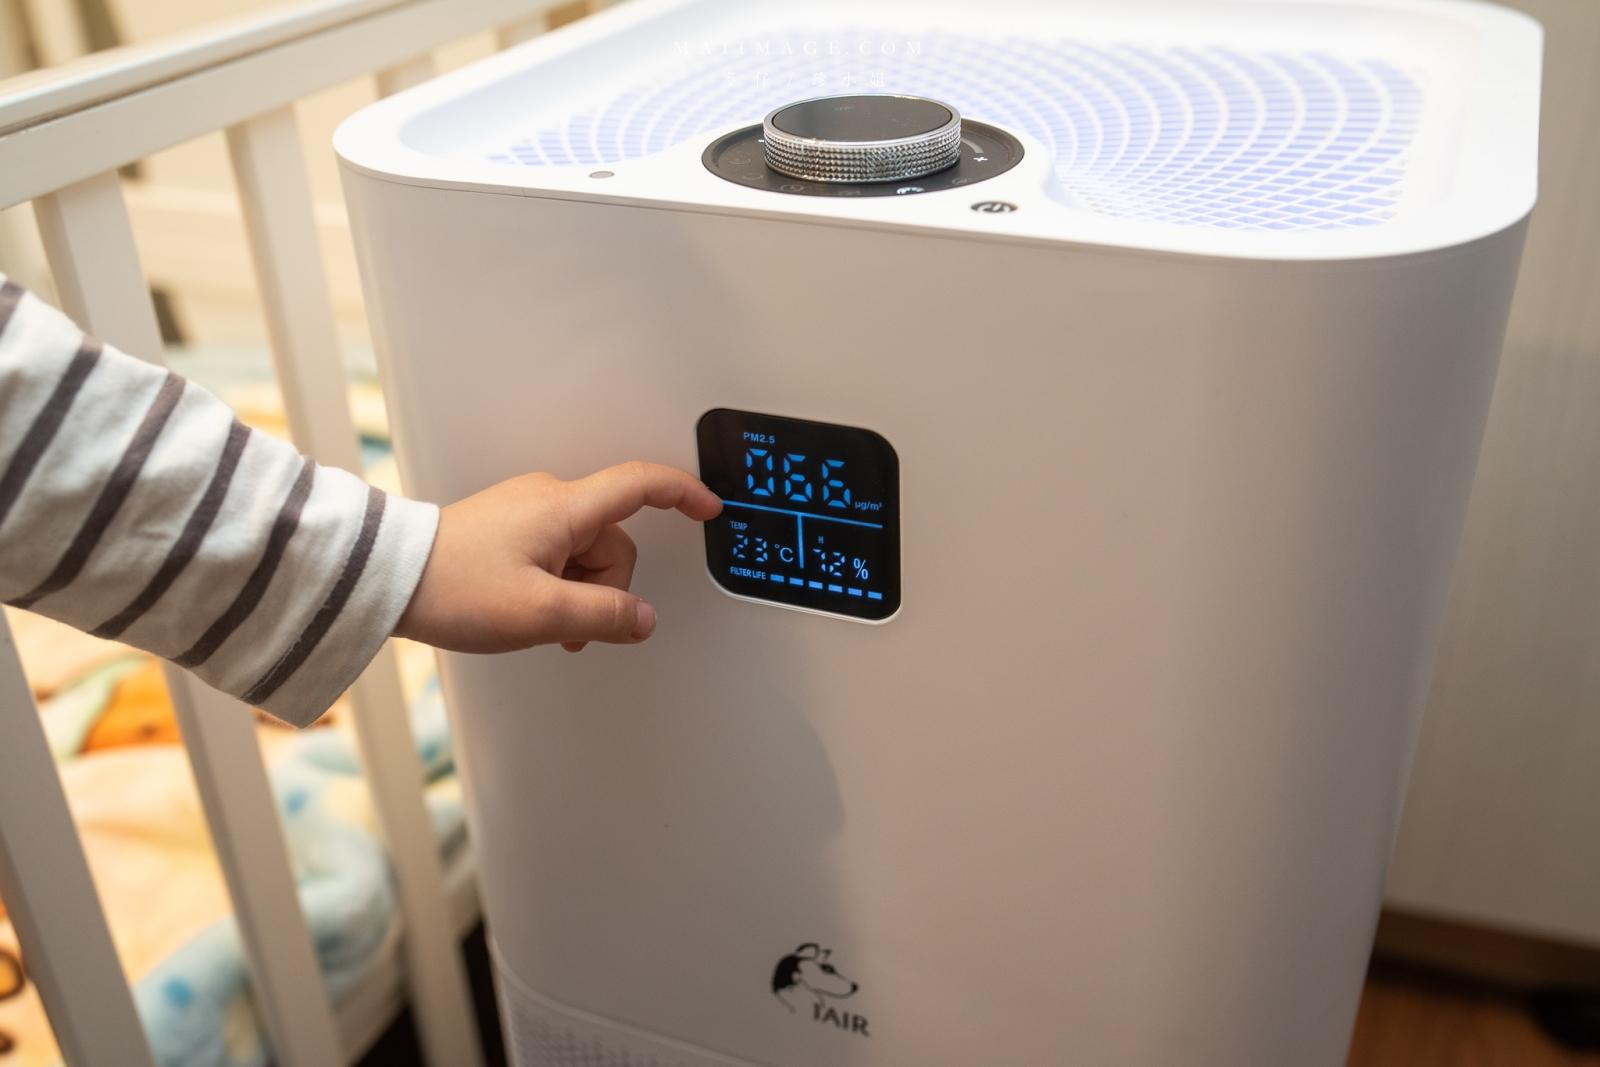 JAIR-P550等離子除菌空氣清淨機~空氣的大小問題就交給他。MIT台灣品牌、大坪數適用。